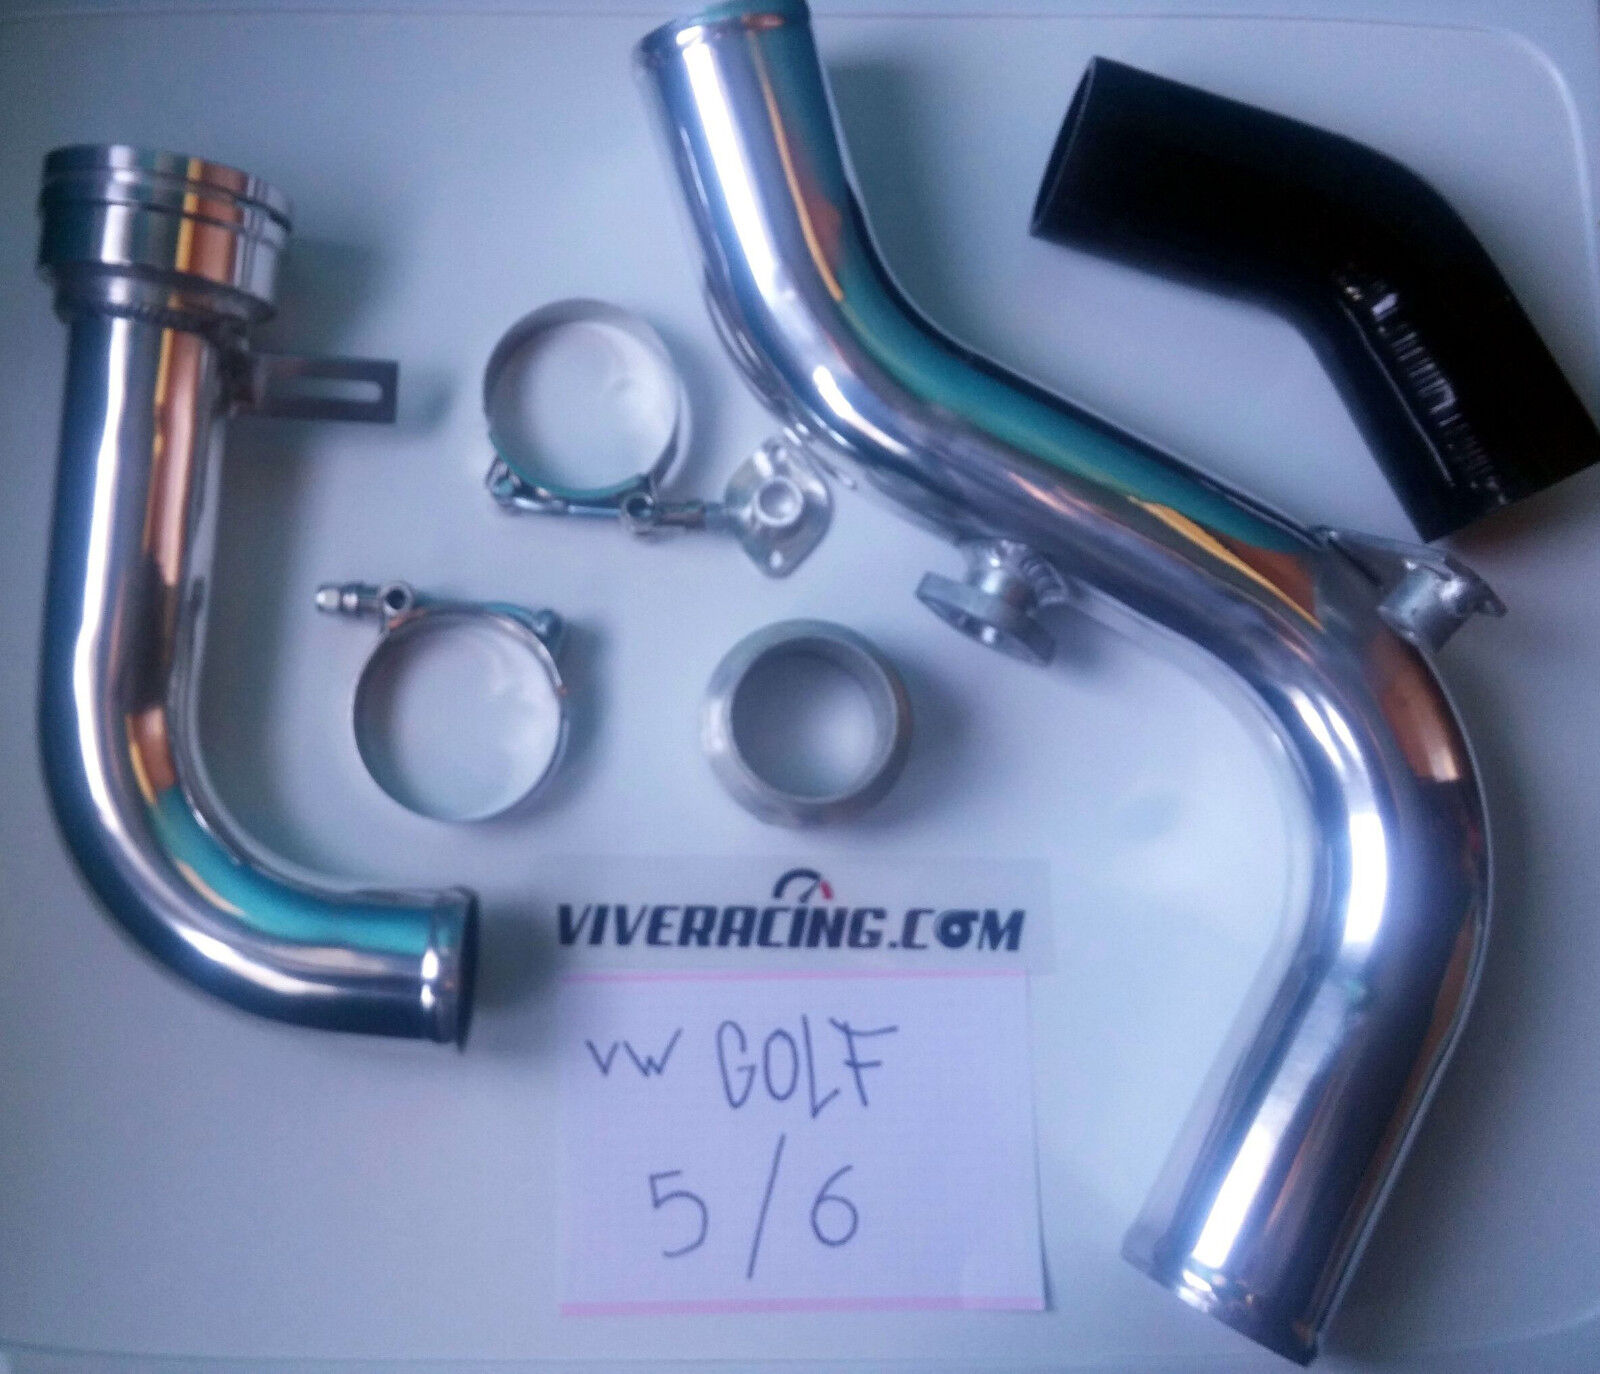 tuberias de turbo PIPING KIT ALUMINUM BOOST PIPE FOR VW GOLF GTI...